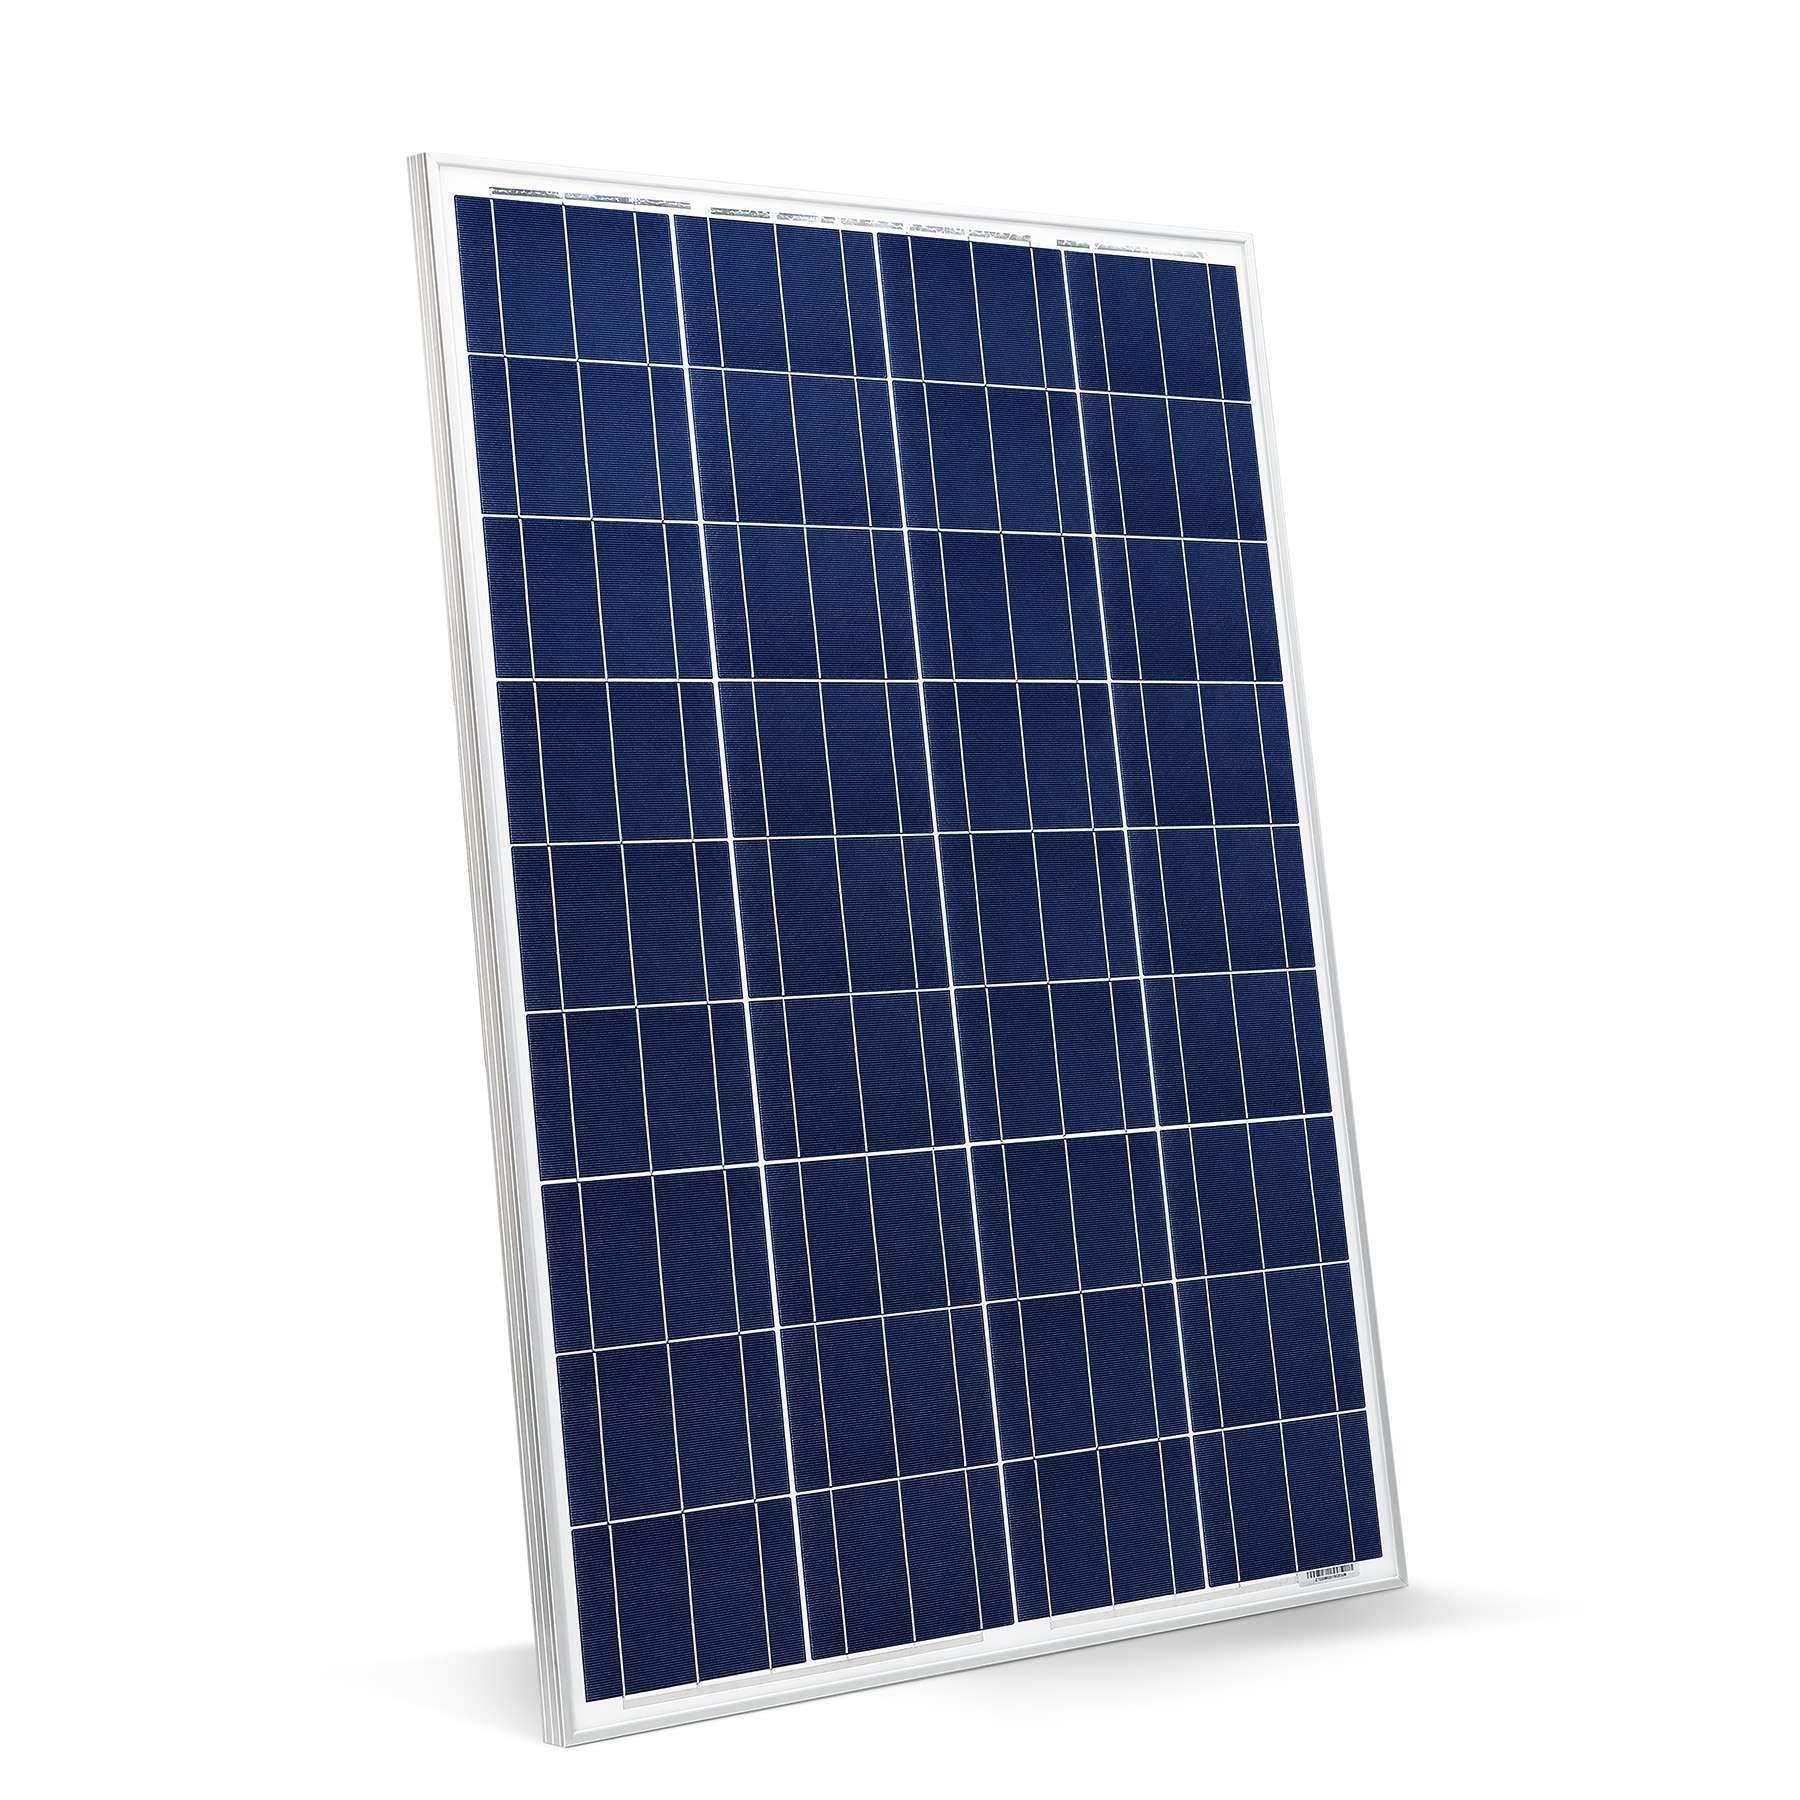 EnerSol 90 Watt solar panel South Africa